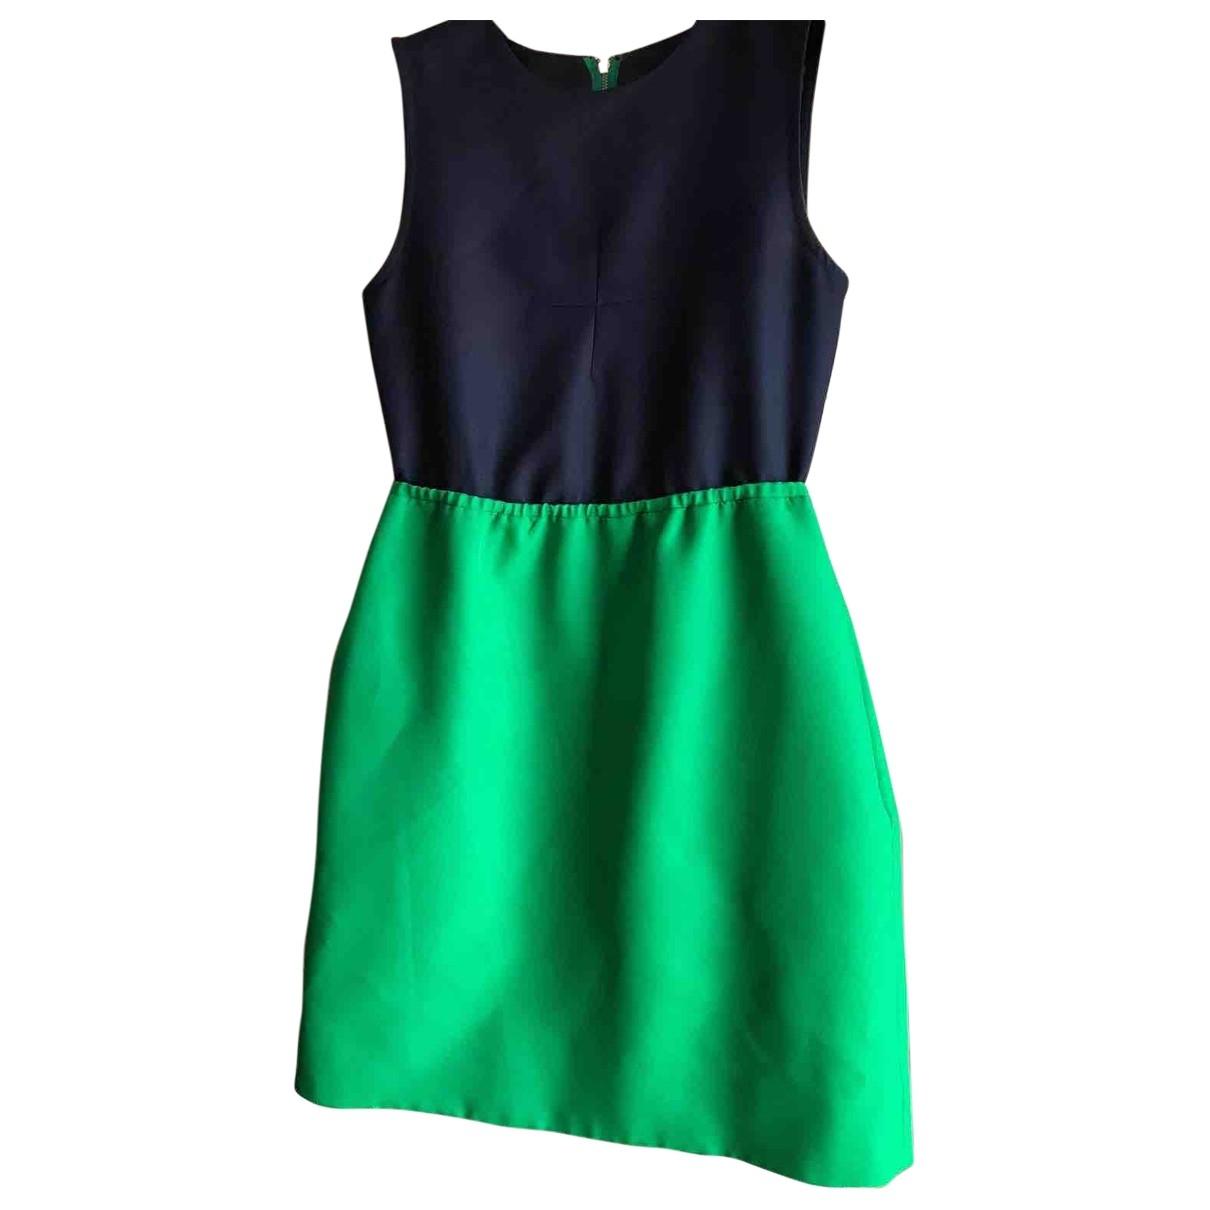 Marc By Marc Jacobs \N Kleid in  Gruen Polyester